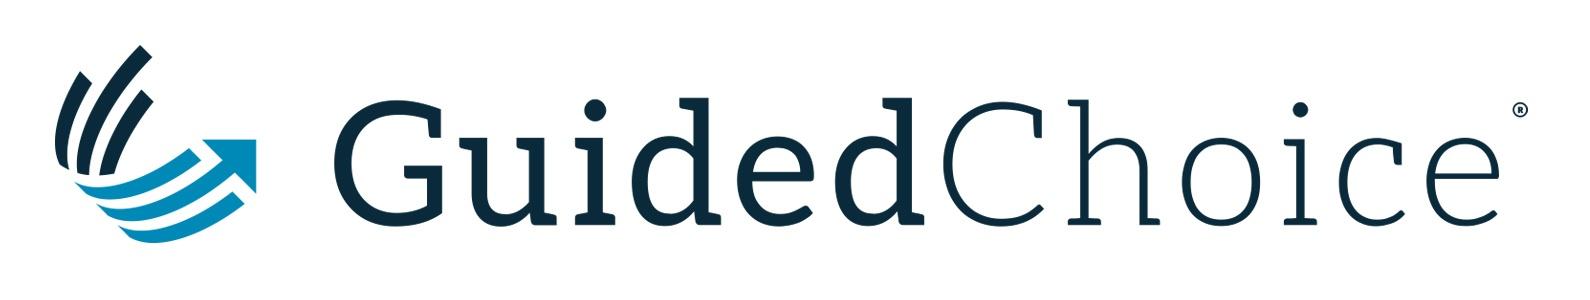 Guided Choice logo full color-1.jpg